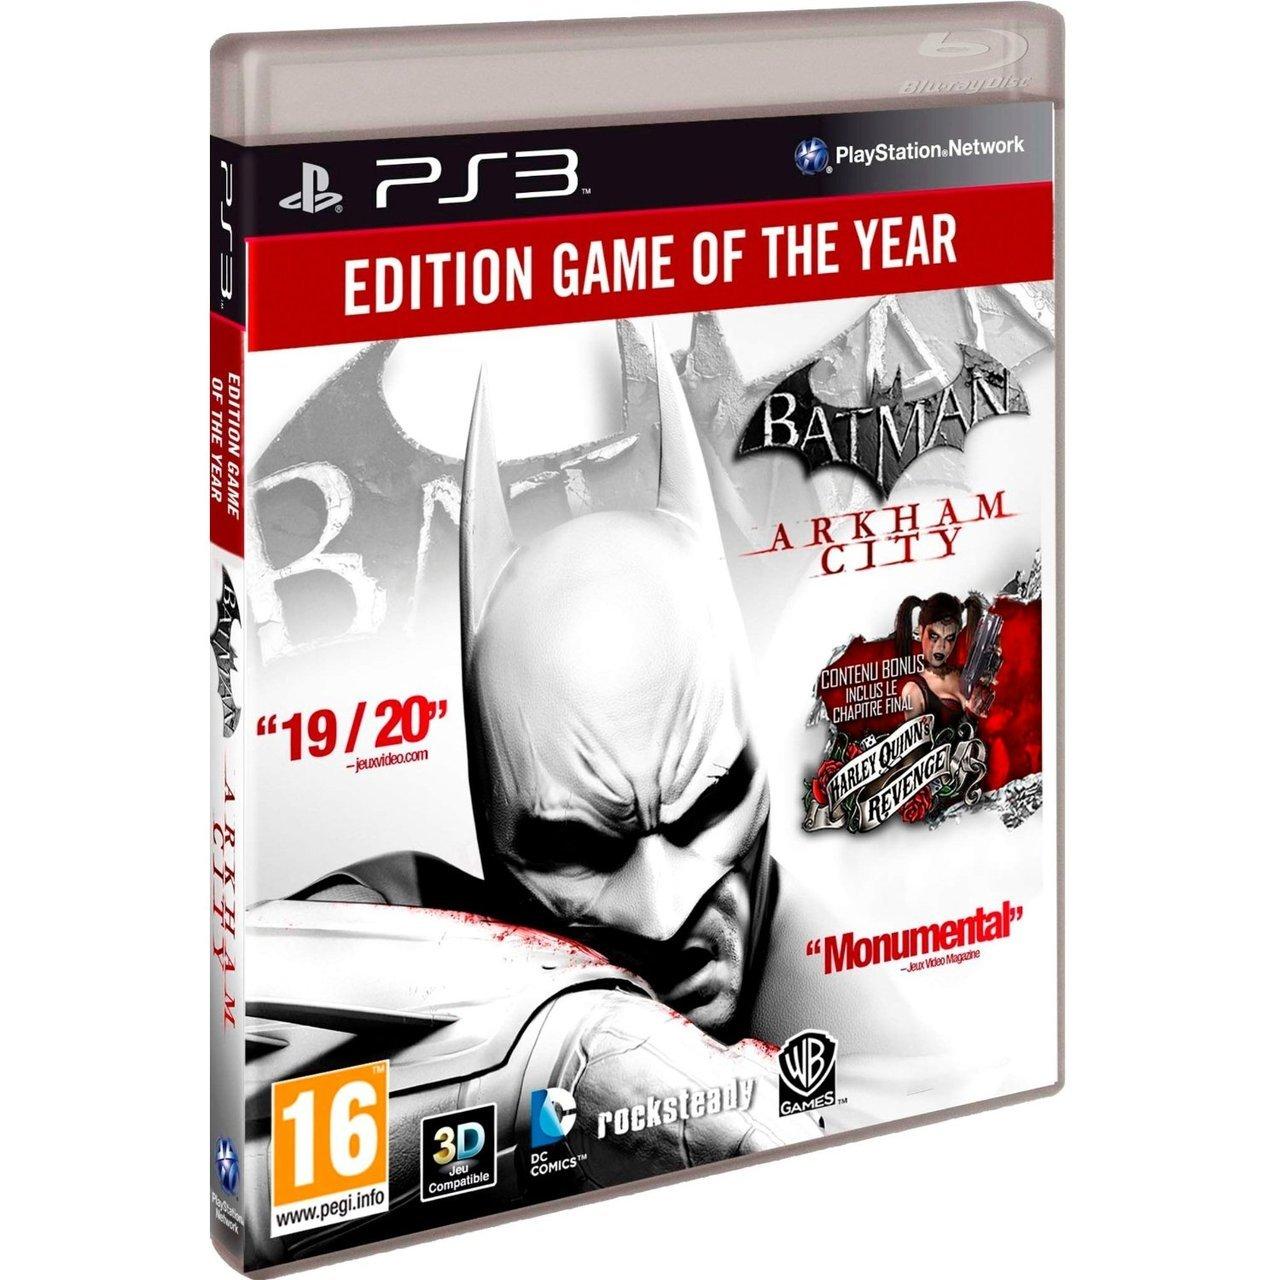 Batman-ArkhamCity-GameoftheYearEdition Multi Div 001